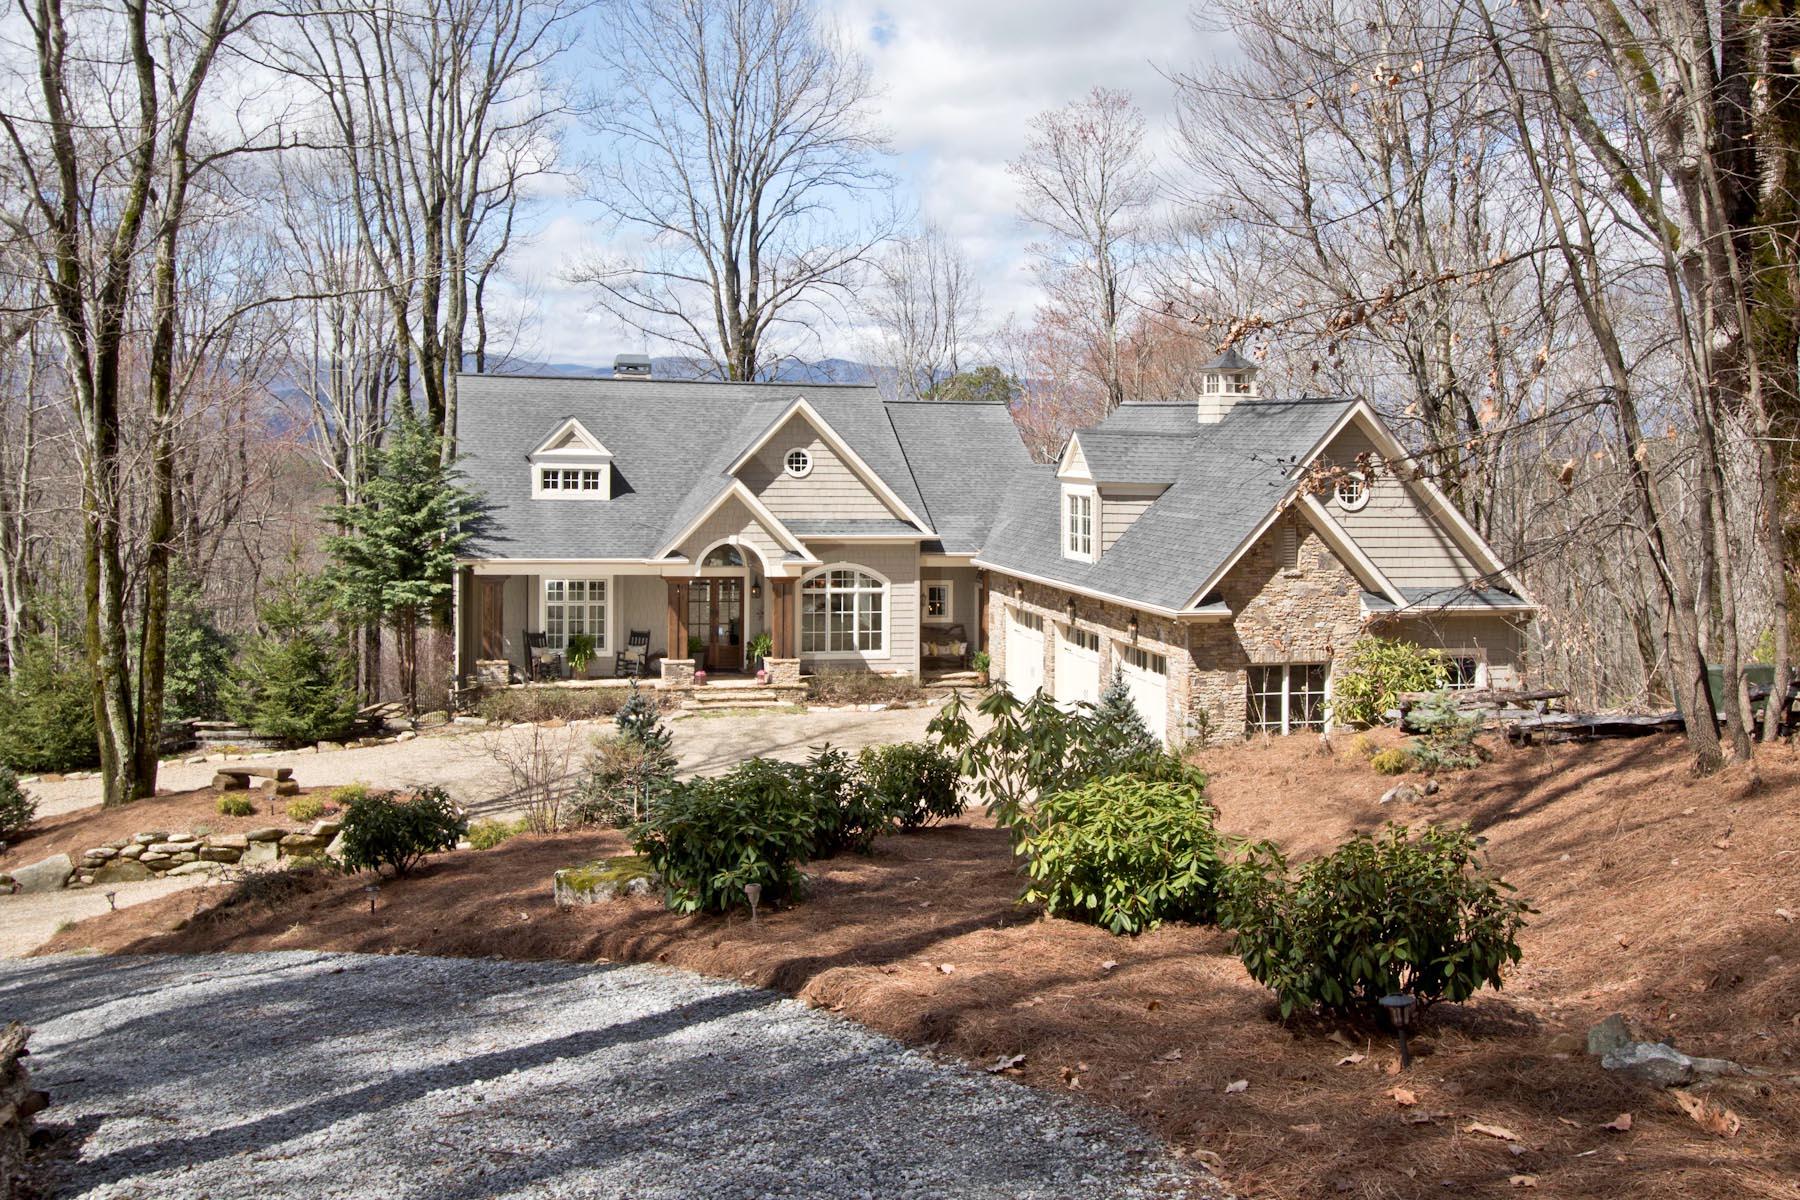 واحد منزل الأسرة للـ Sale في 585 Hurrah Ridge Scaly Mountain, North Carolina, 28775 United States